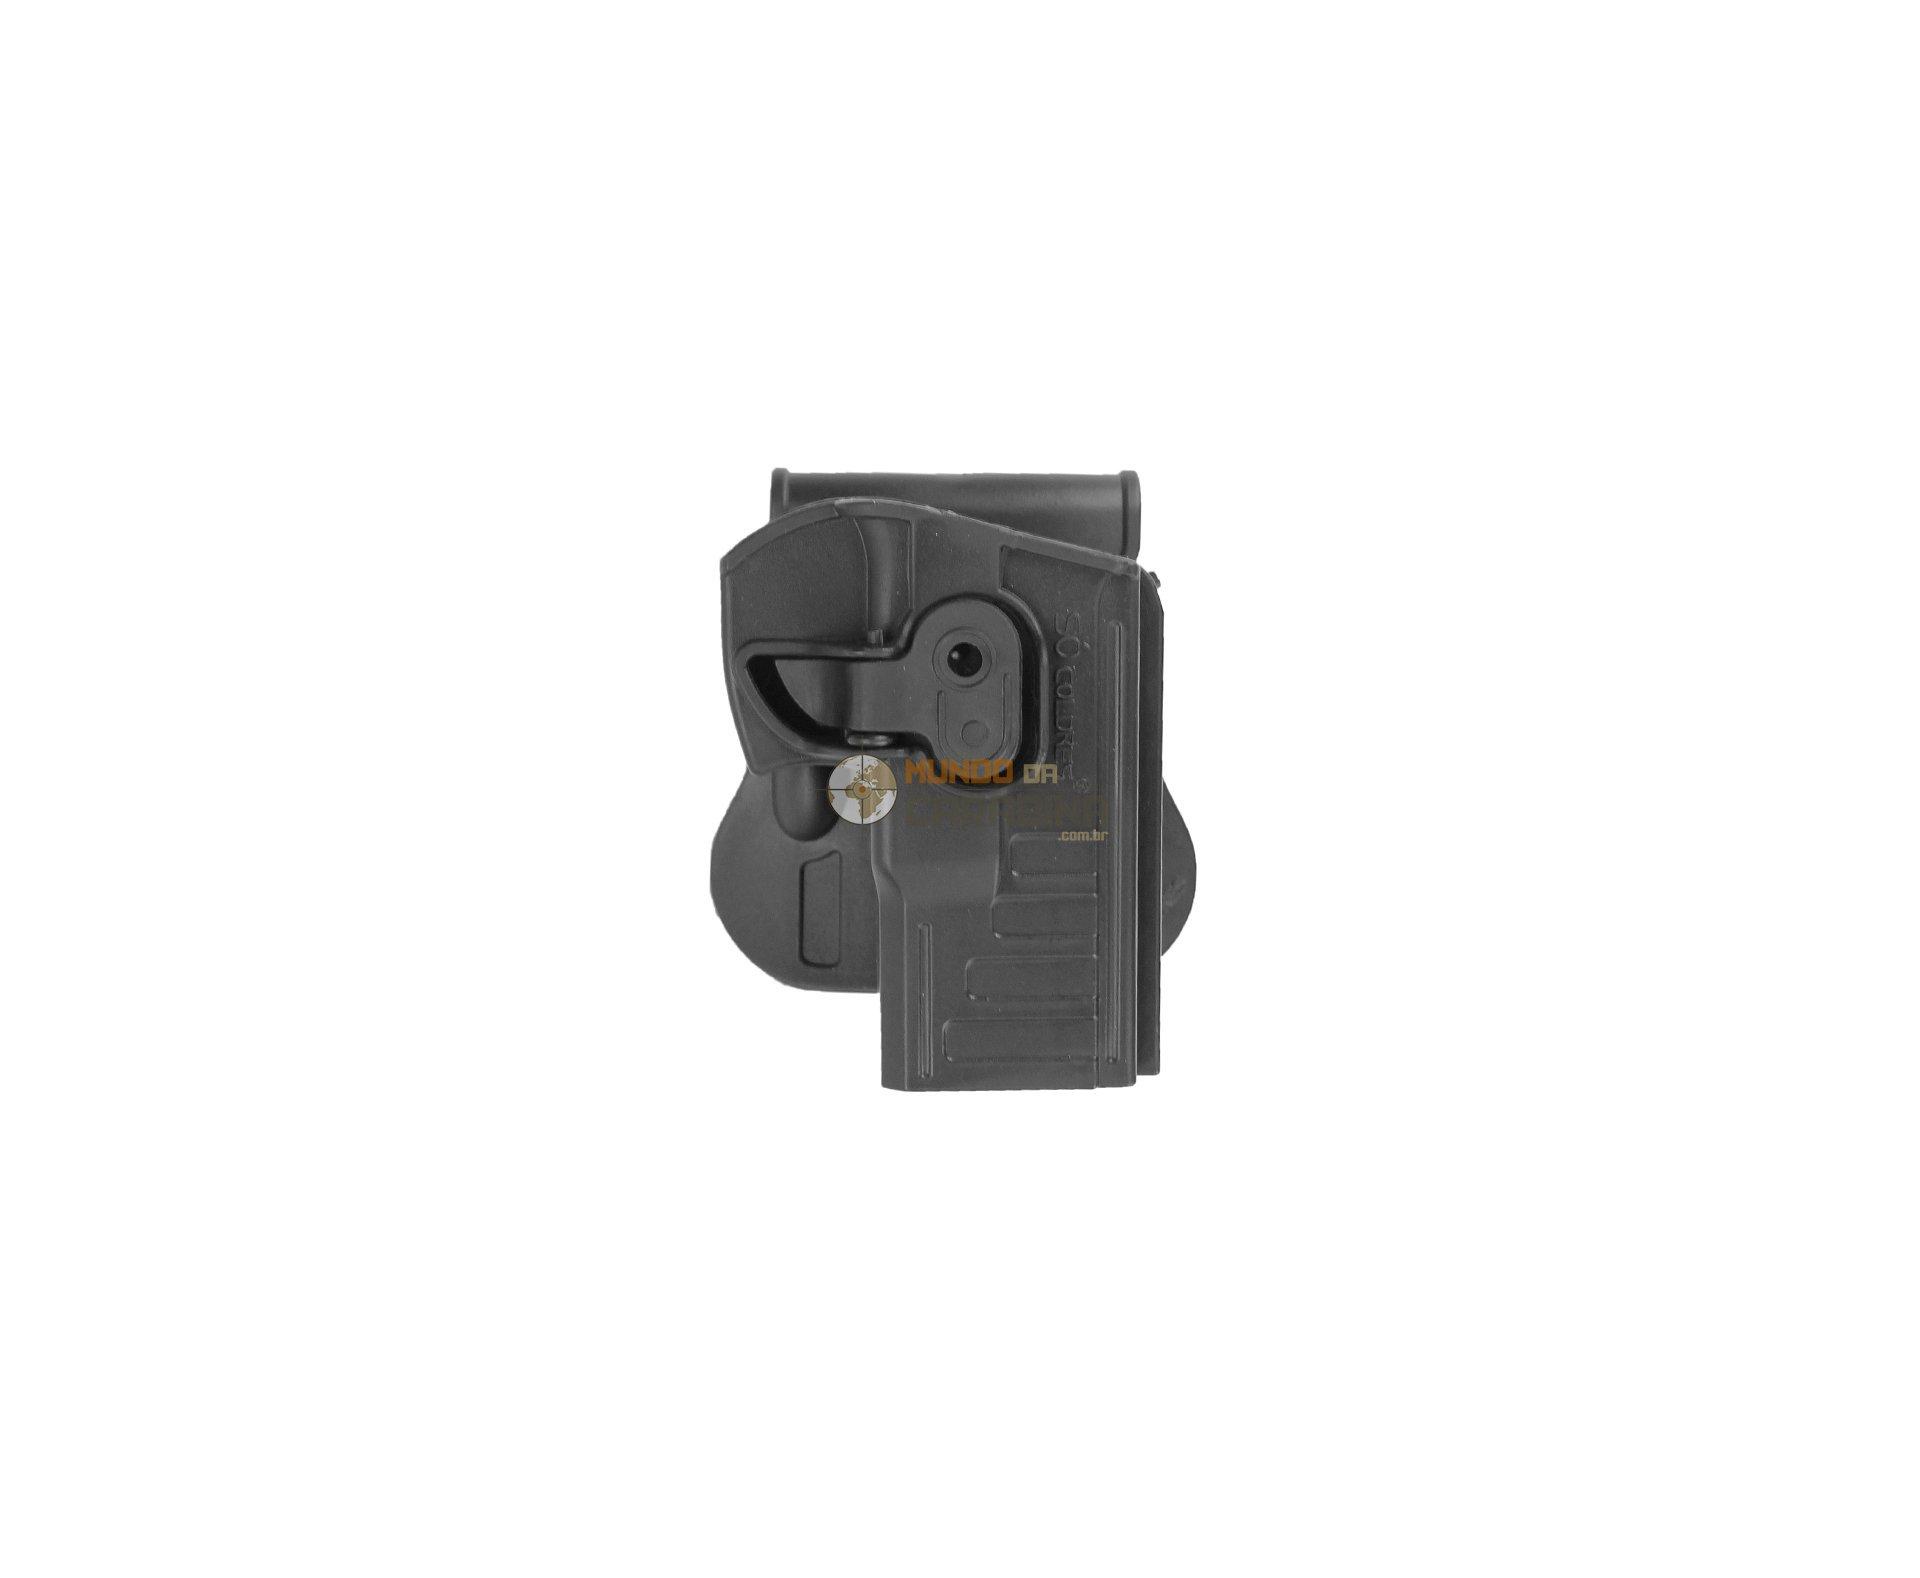 Coldre De Cintura Com Trava Pistola Taurus Pt 24/7 -838-840 (destro) - So Coldres